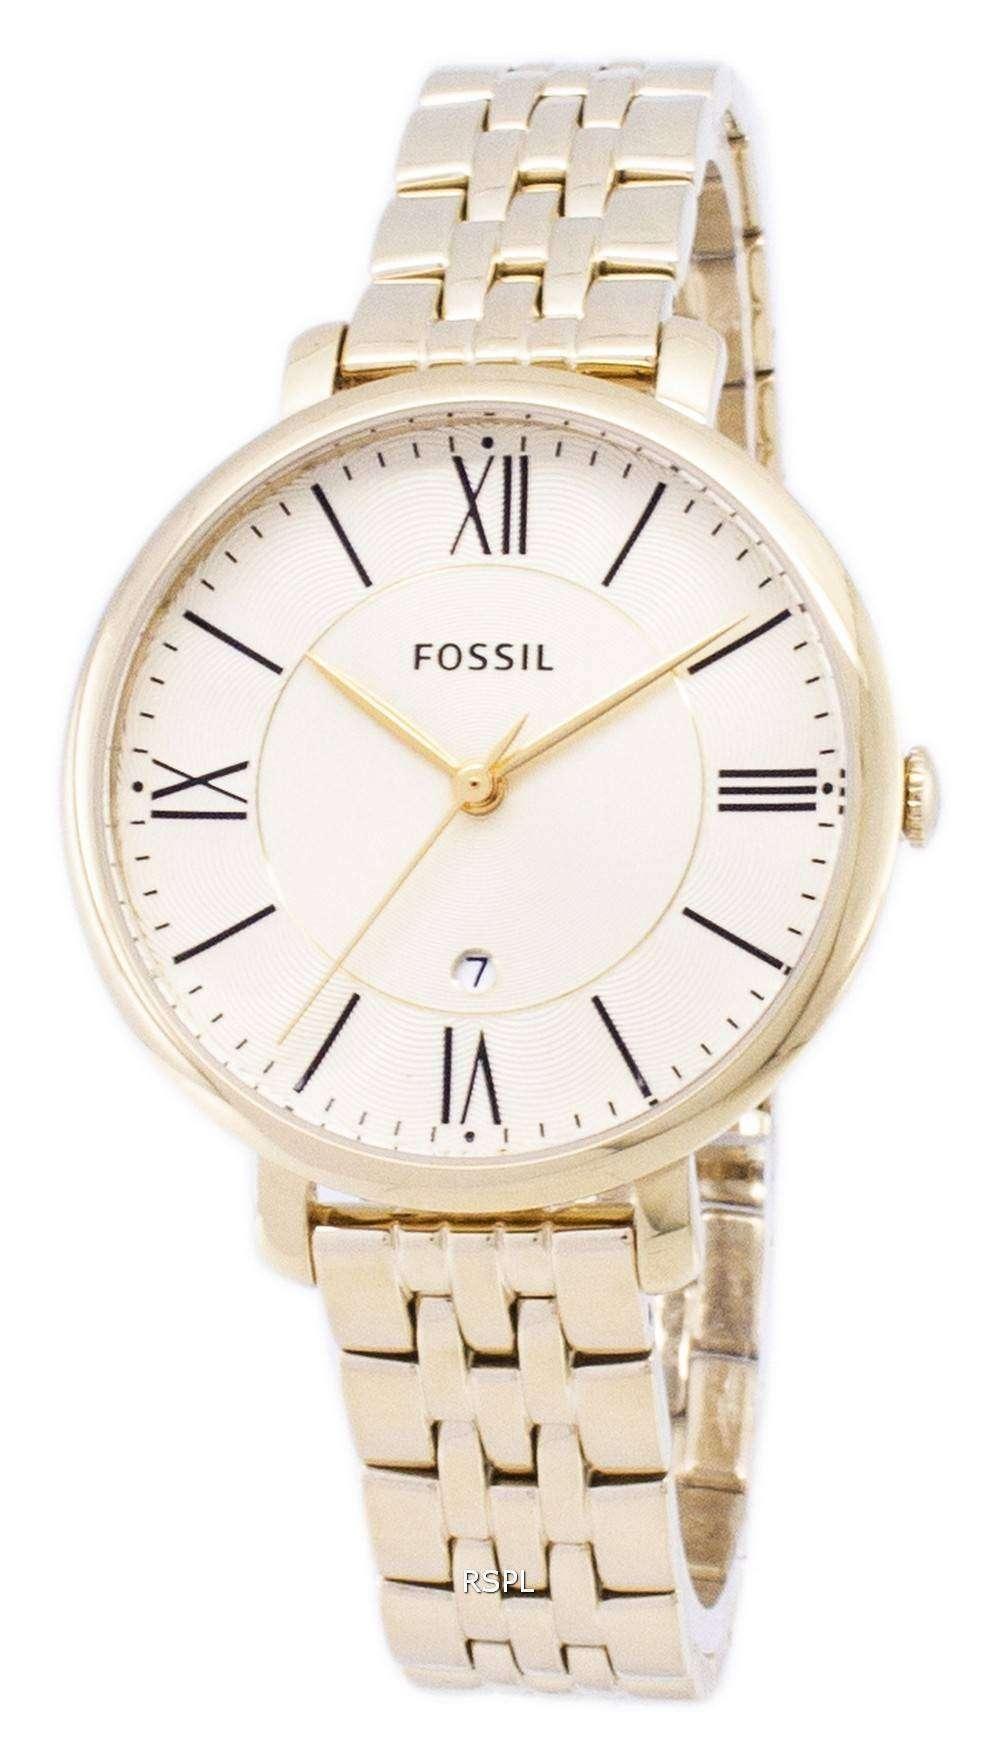 9025b7568ff5 Fósiles Jacqueline Champagne Dial acero dorado ES3434 reloj de mujeres